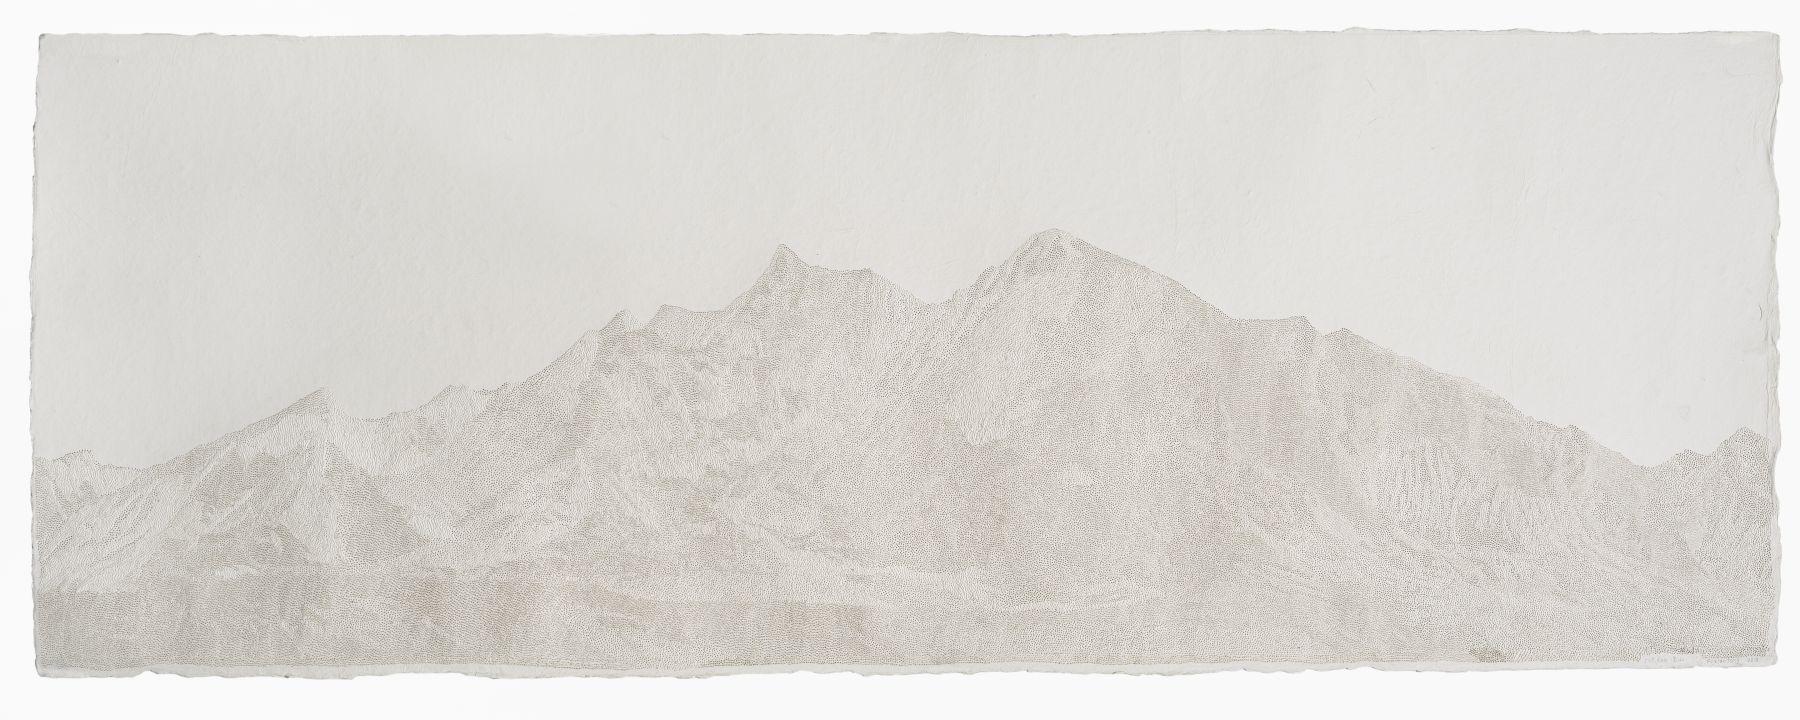 Fu Xiaotong 付小桐 (b. 1976), 518,600 Pinpricks-Sacred Mountain 518,600 孔-圣山